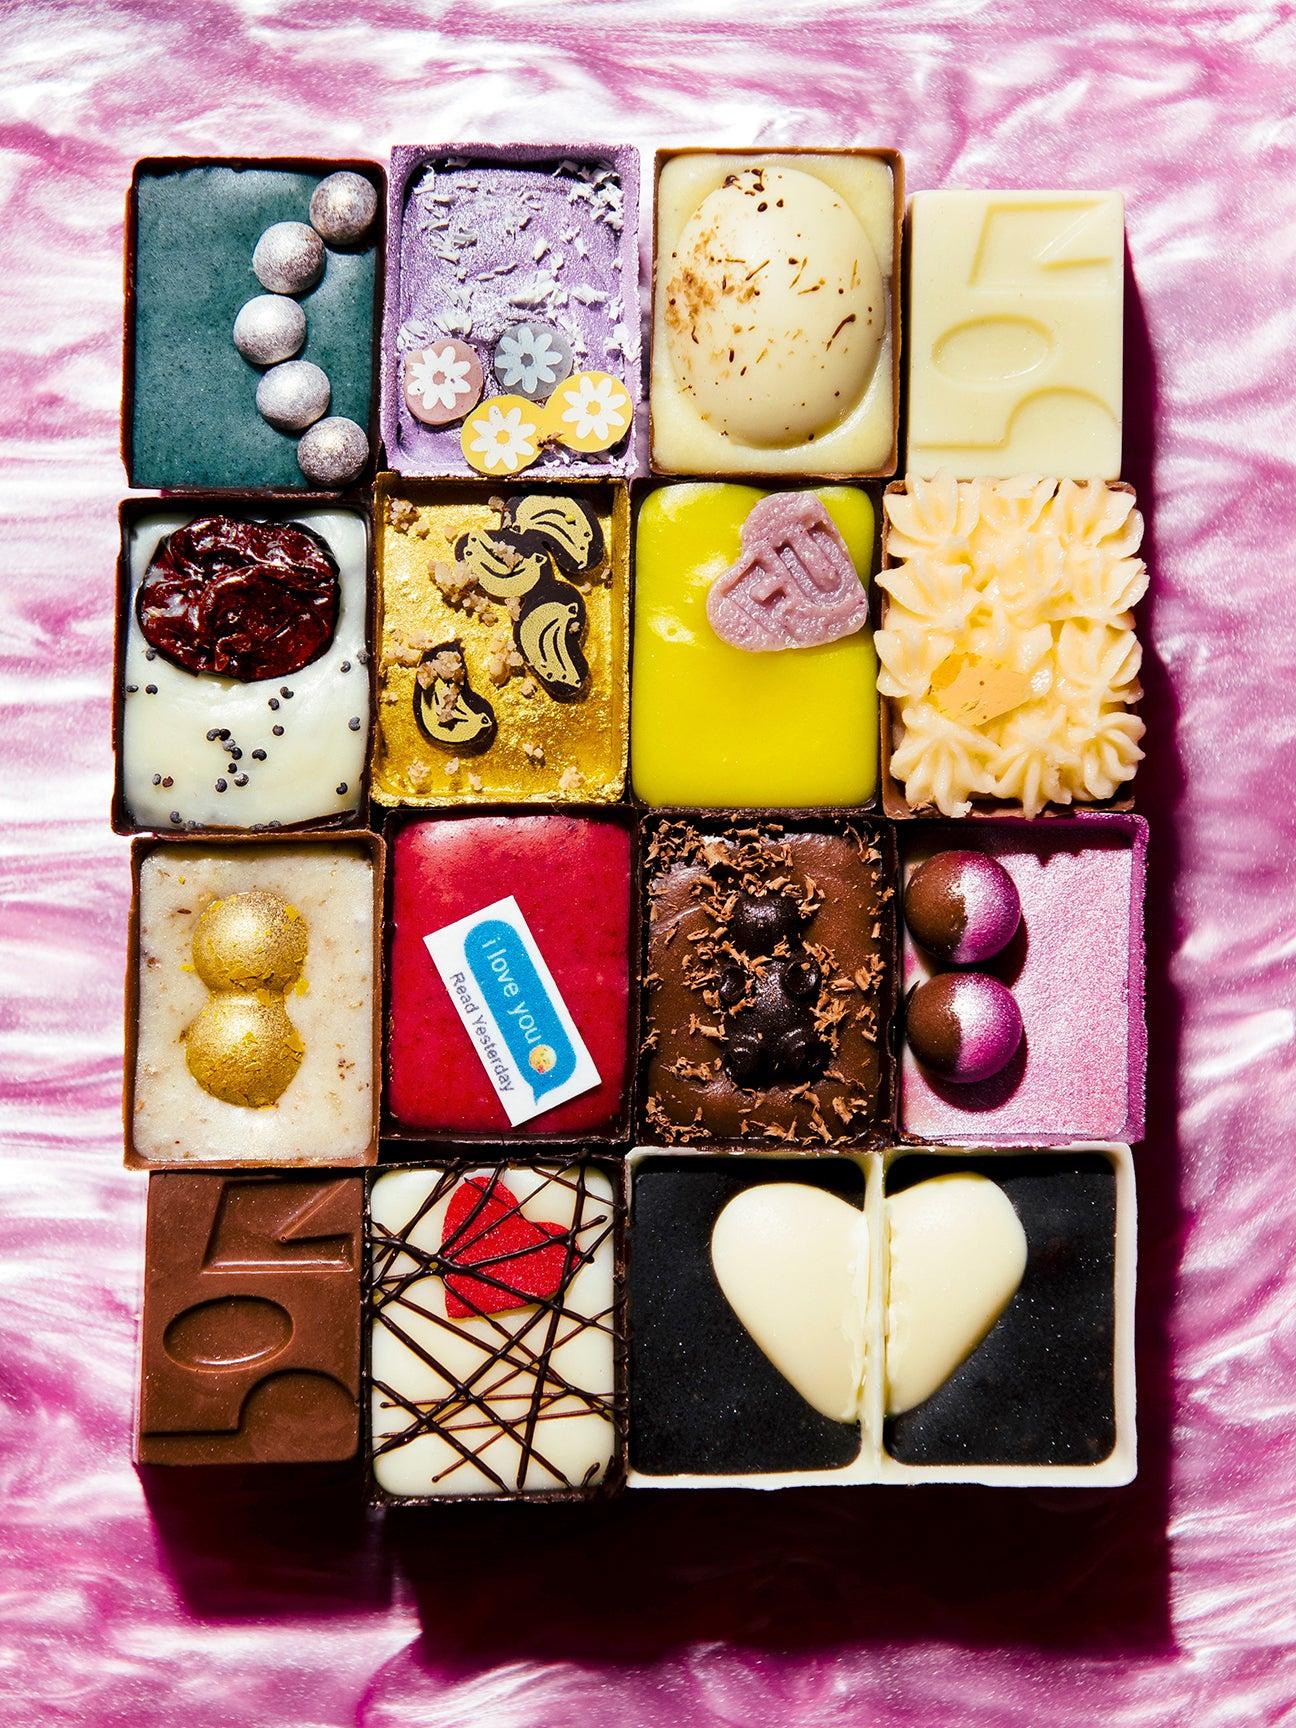 Colorful chocolates